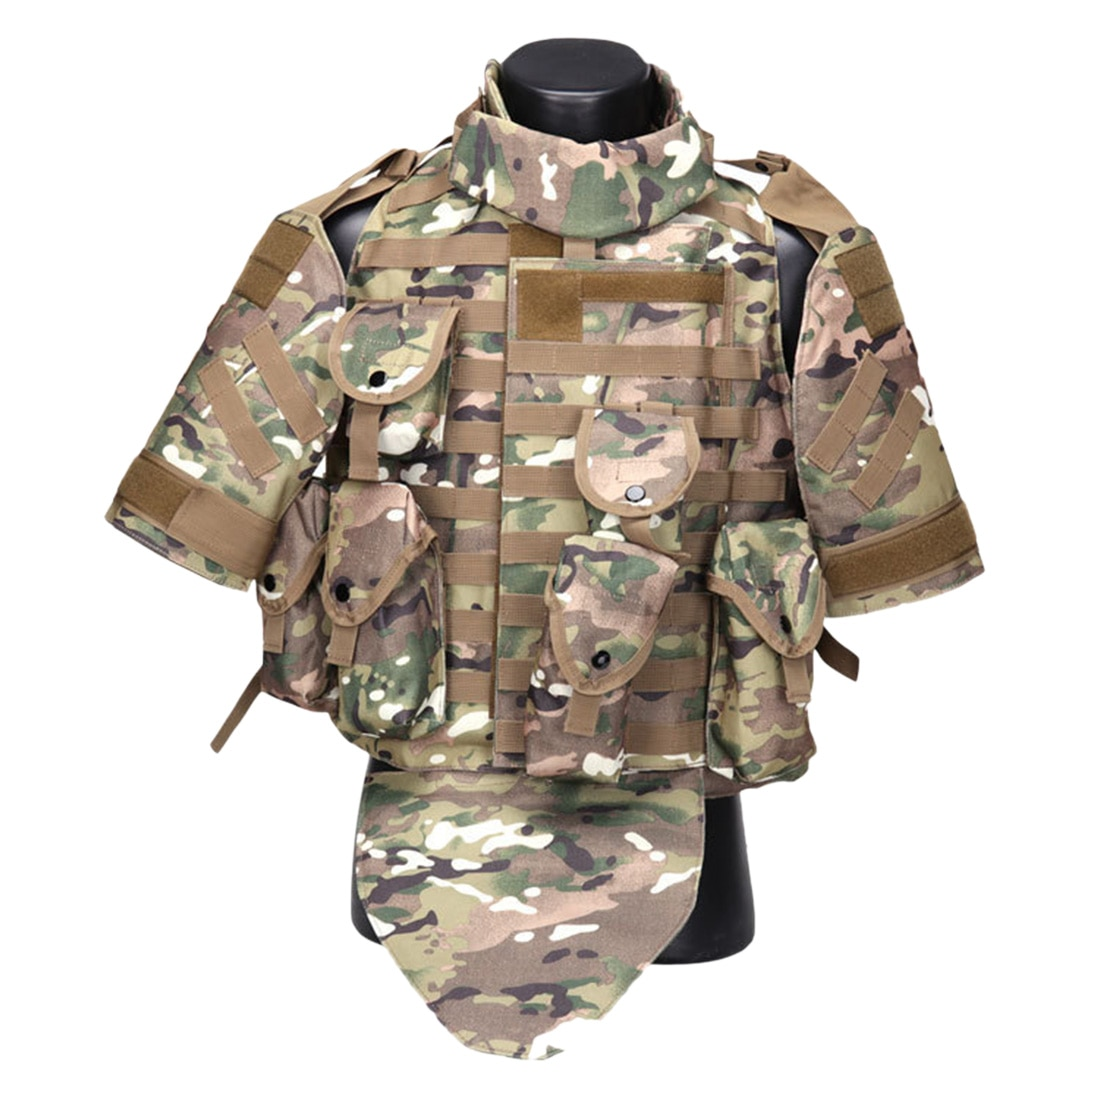 Loup esclaves Phantom Interceptor tactique darmure corporelle OTV modulaire-CP/Olive Drab/Camouflage Jungle/Tan/ACU/noir